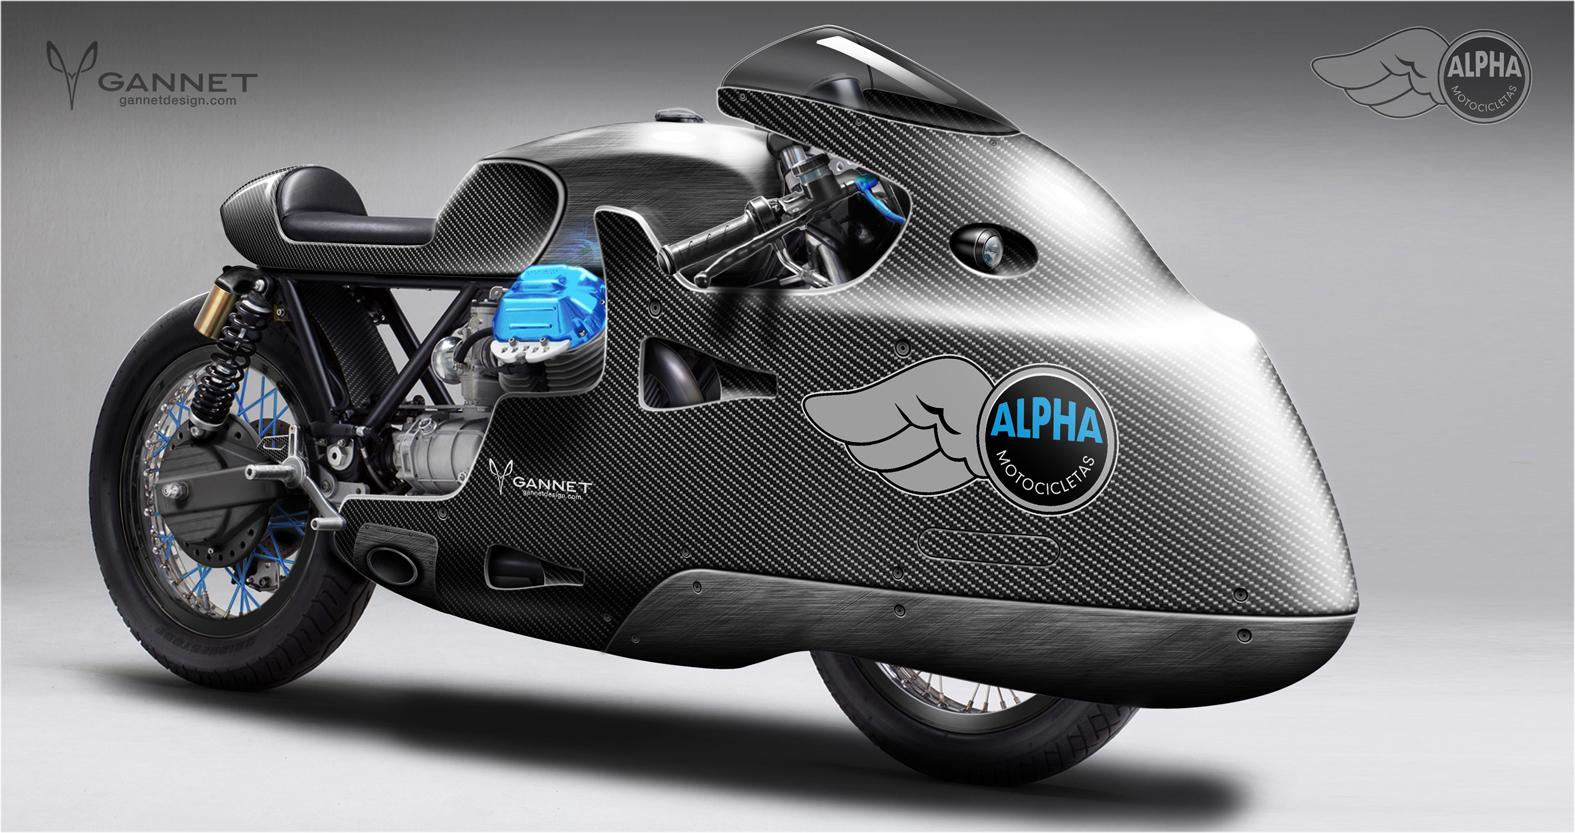 Moto Guzzi Gannet Design